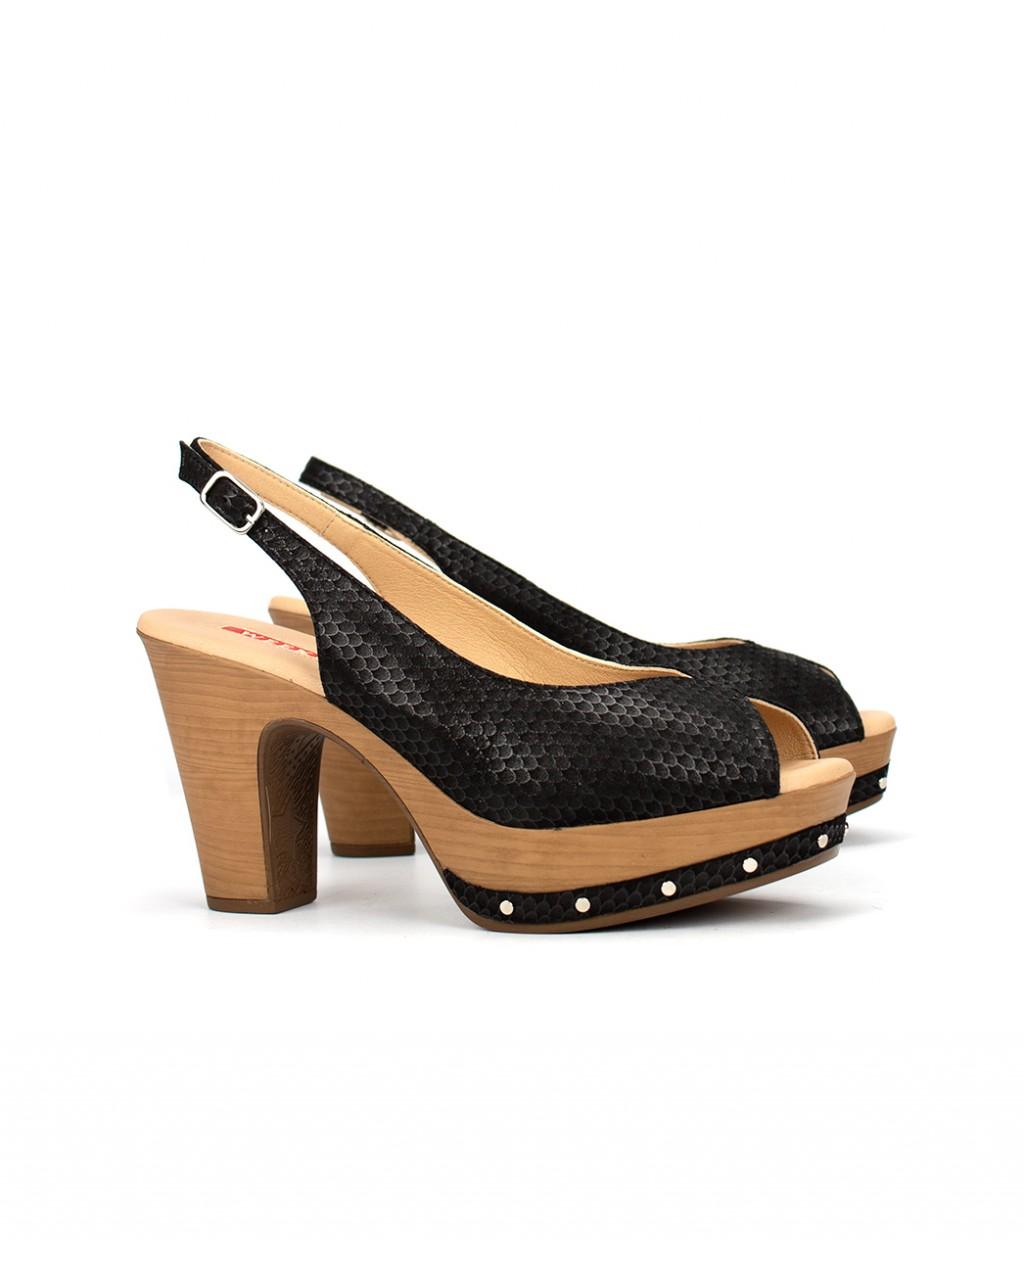 Sandalias De Tacon Mujer Napa Weekend Negro f7g6by